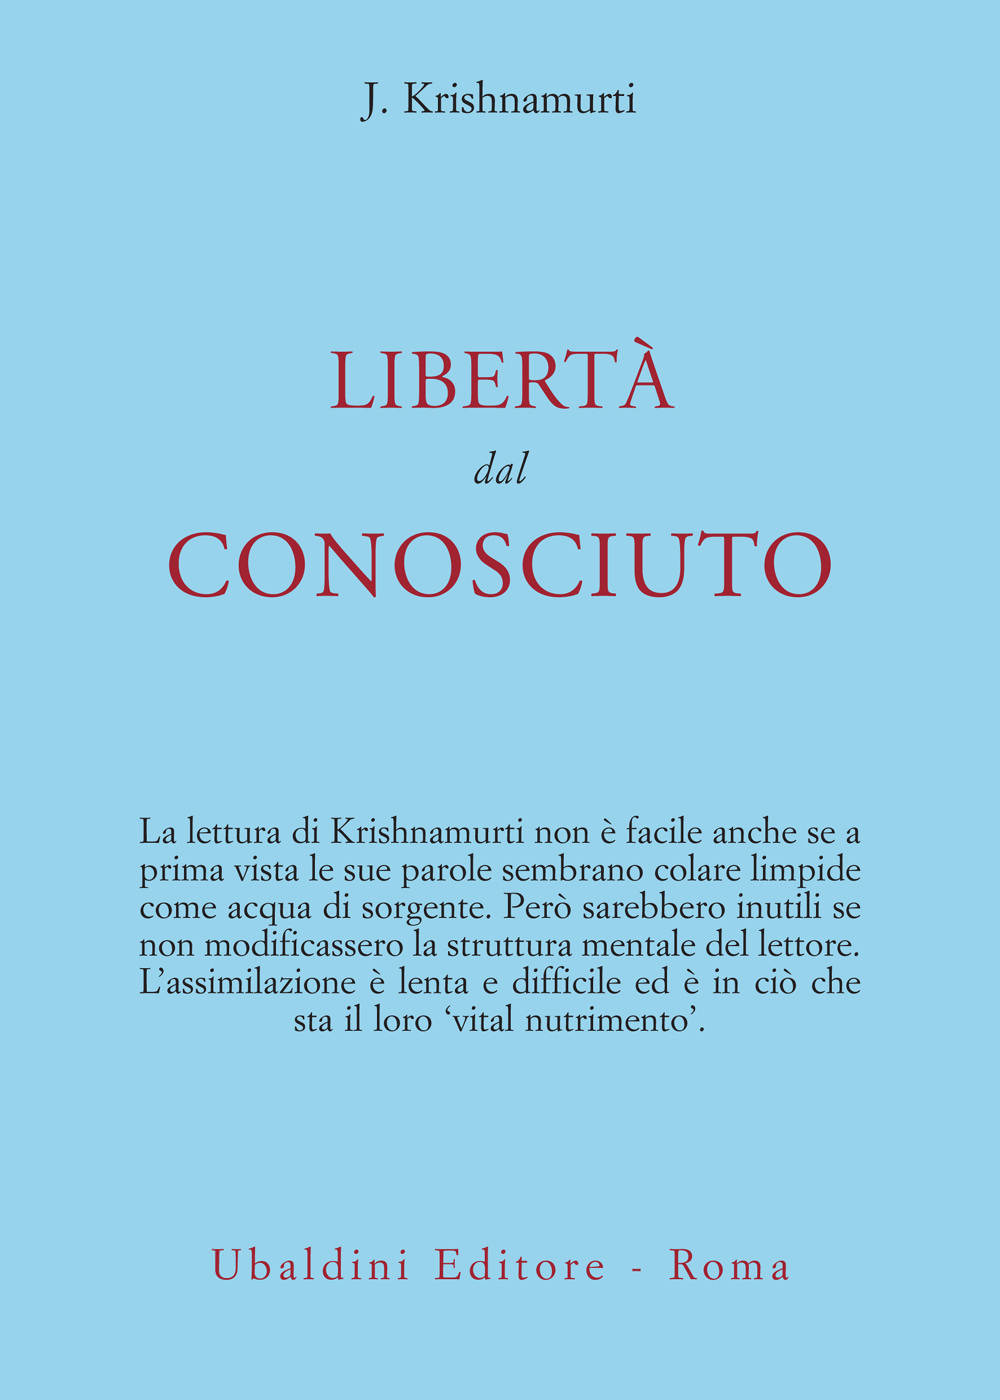 Jiddu Krishnamurti, Libertà dal conosciuto